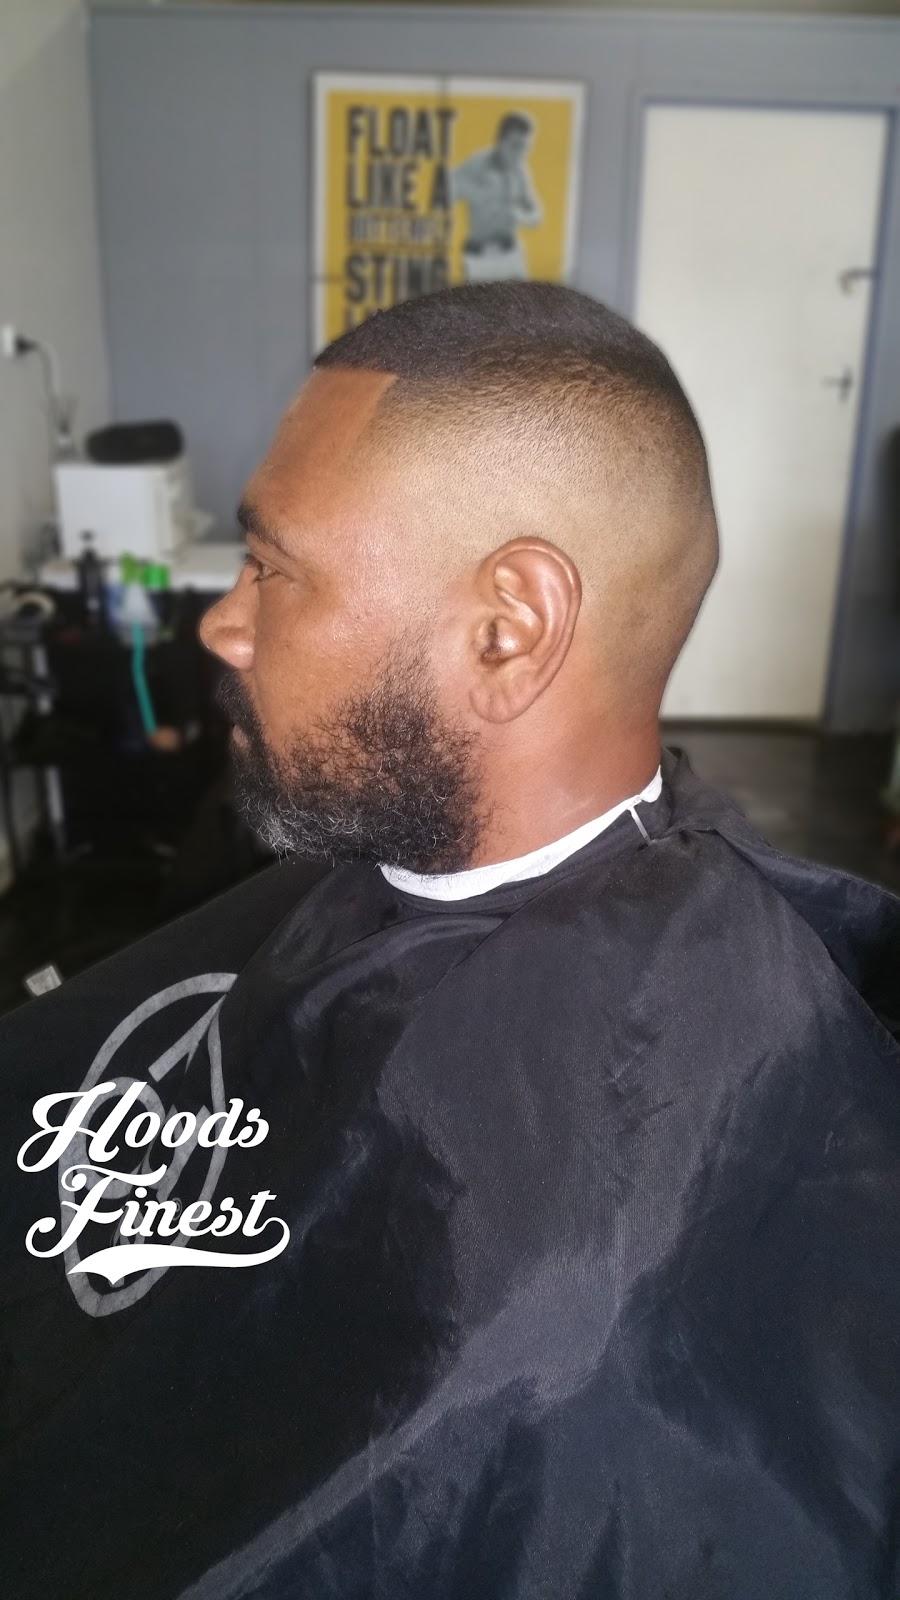 Hoods Finest Barbershop Newcastle | hair care | 4/25 Irving St, Edgeworth NSW 2285, Australia | 0411642868 OR +61 411 642 868